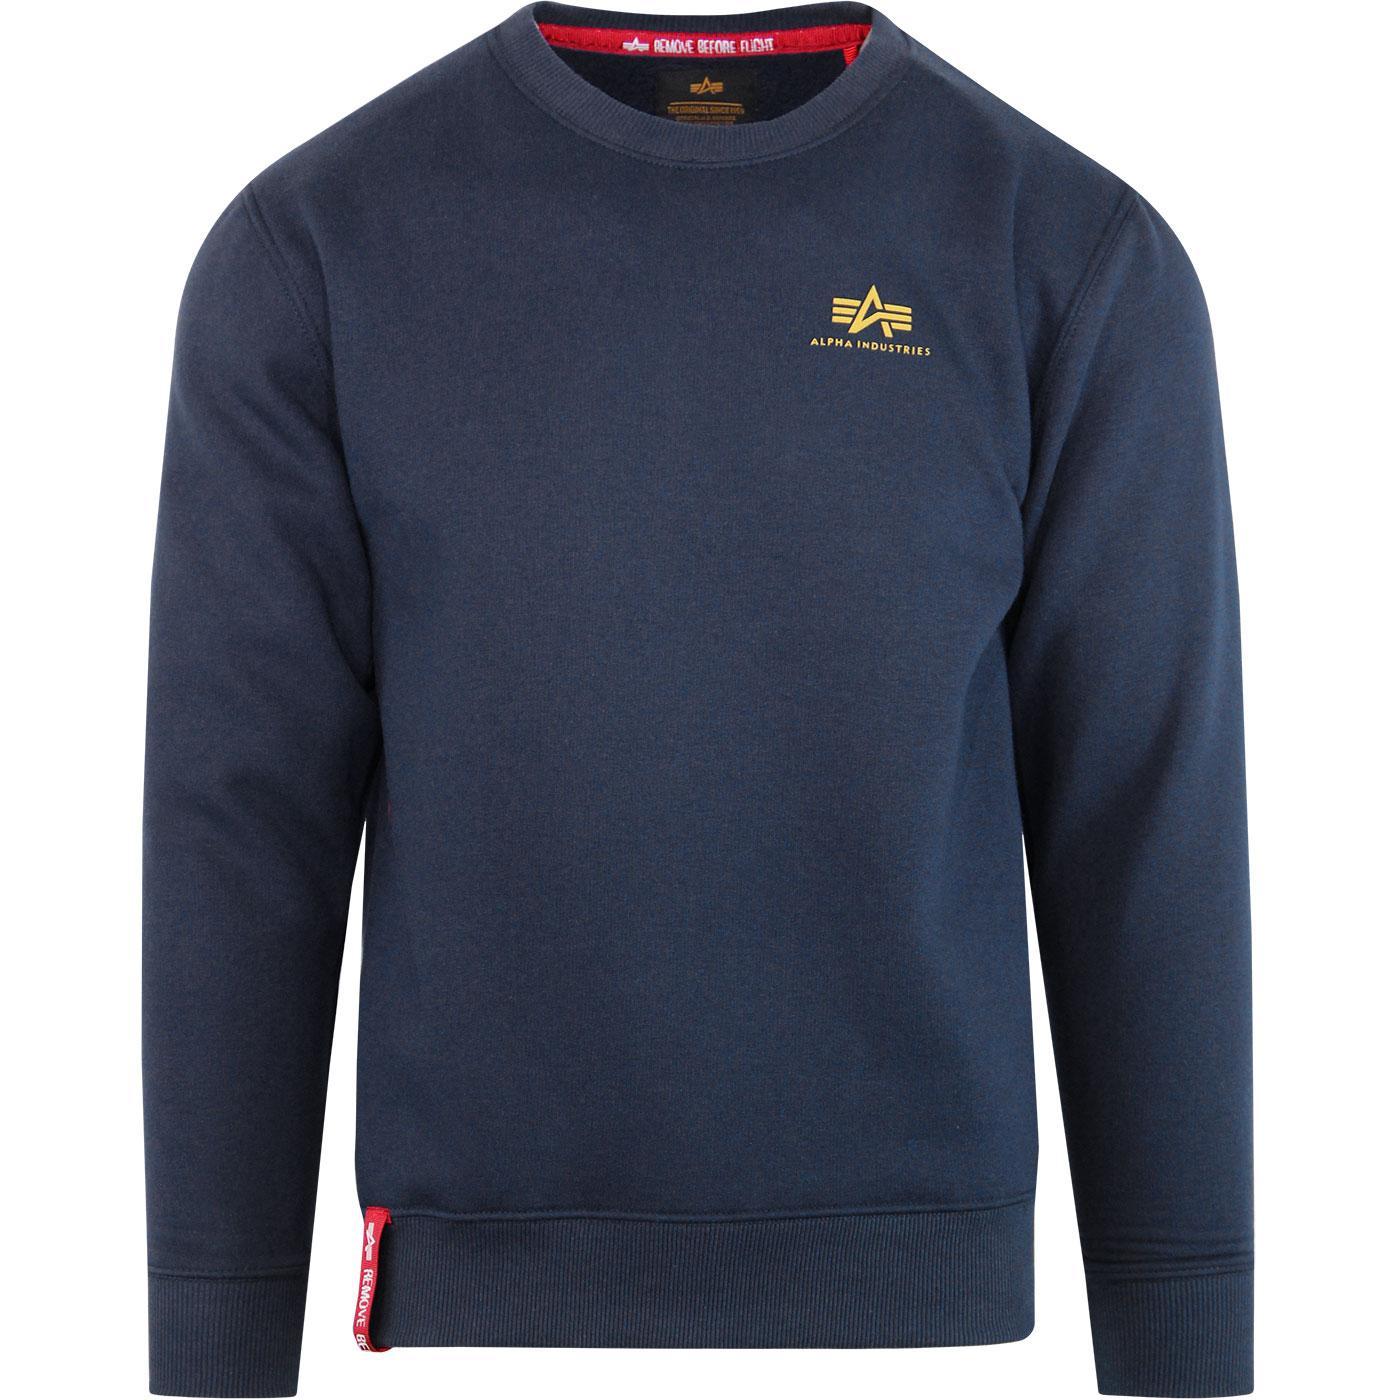 ALPHA INDUSTRIES Basic Small Logo Sweater New Navy